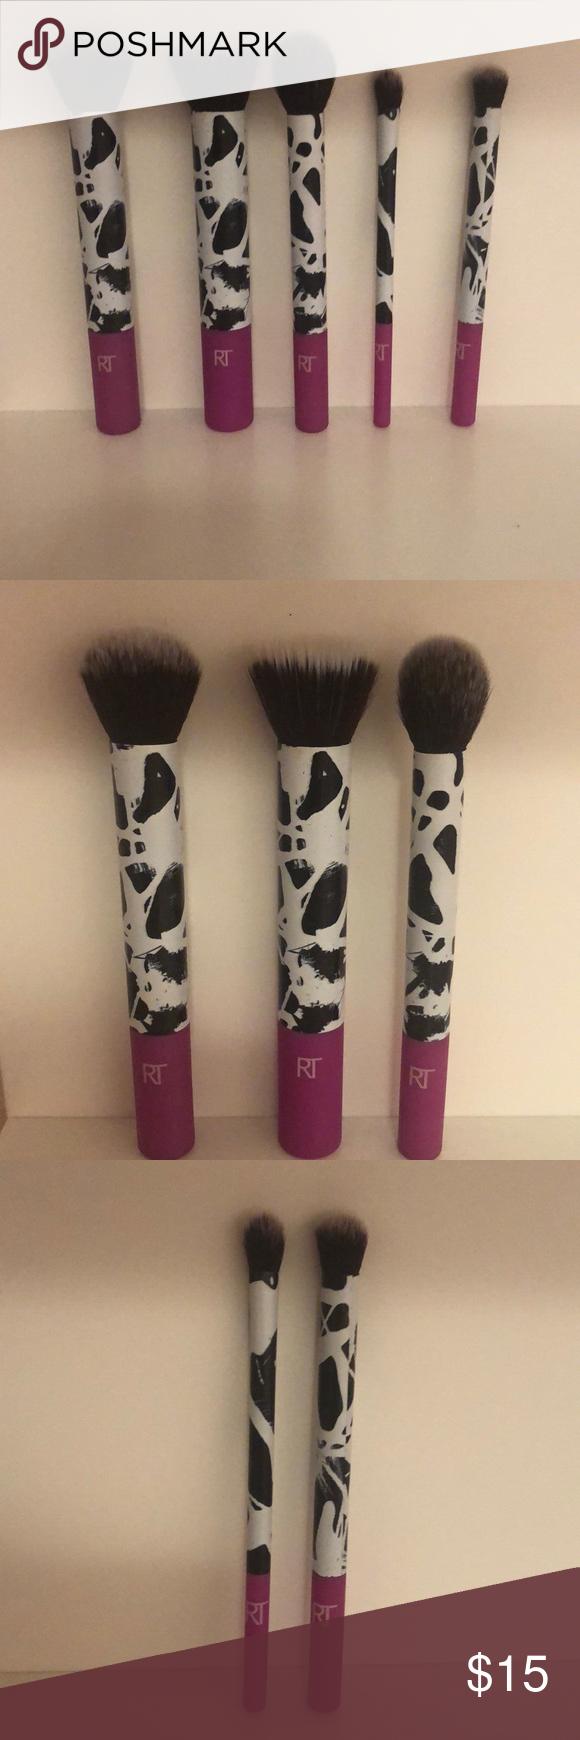 real techniques makeup brush set berlin💜 Real techniques